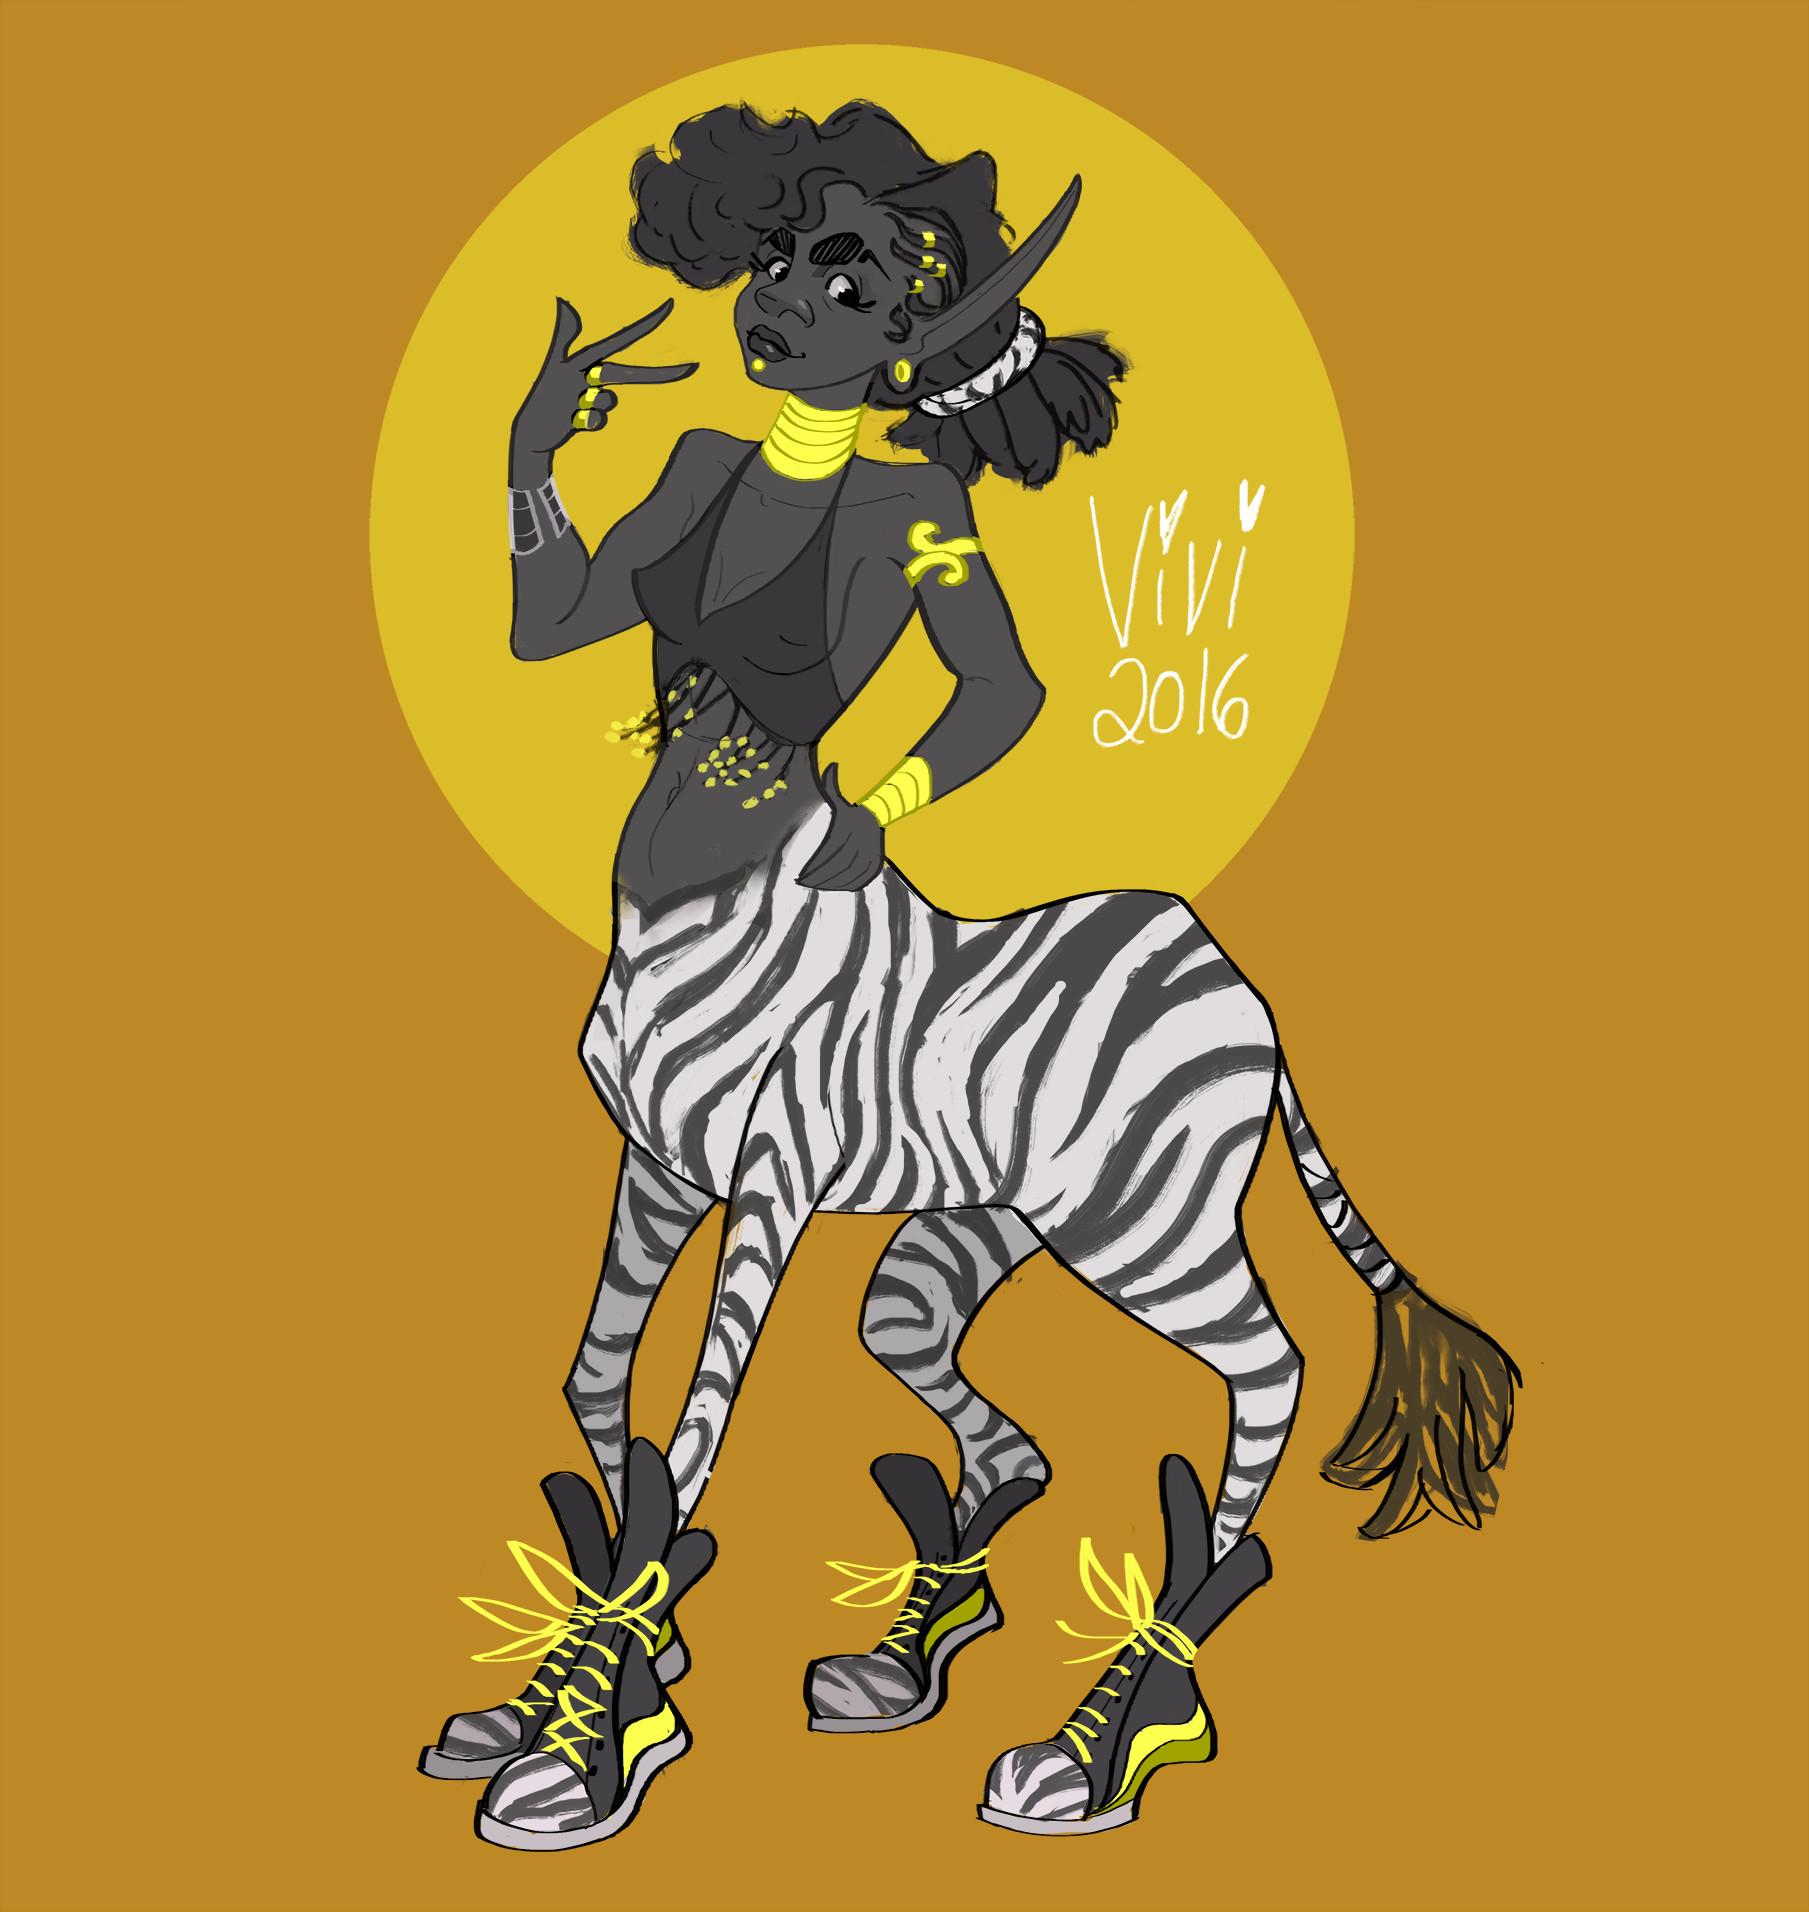 Vivien lulkowski centaur gal